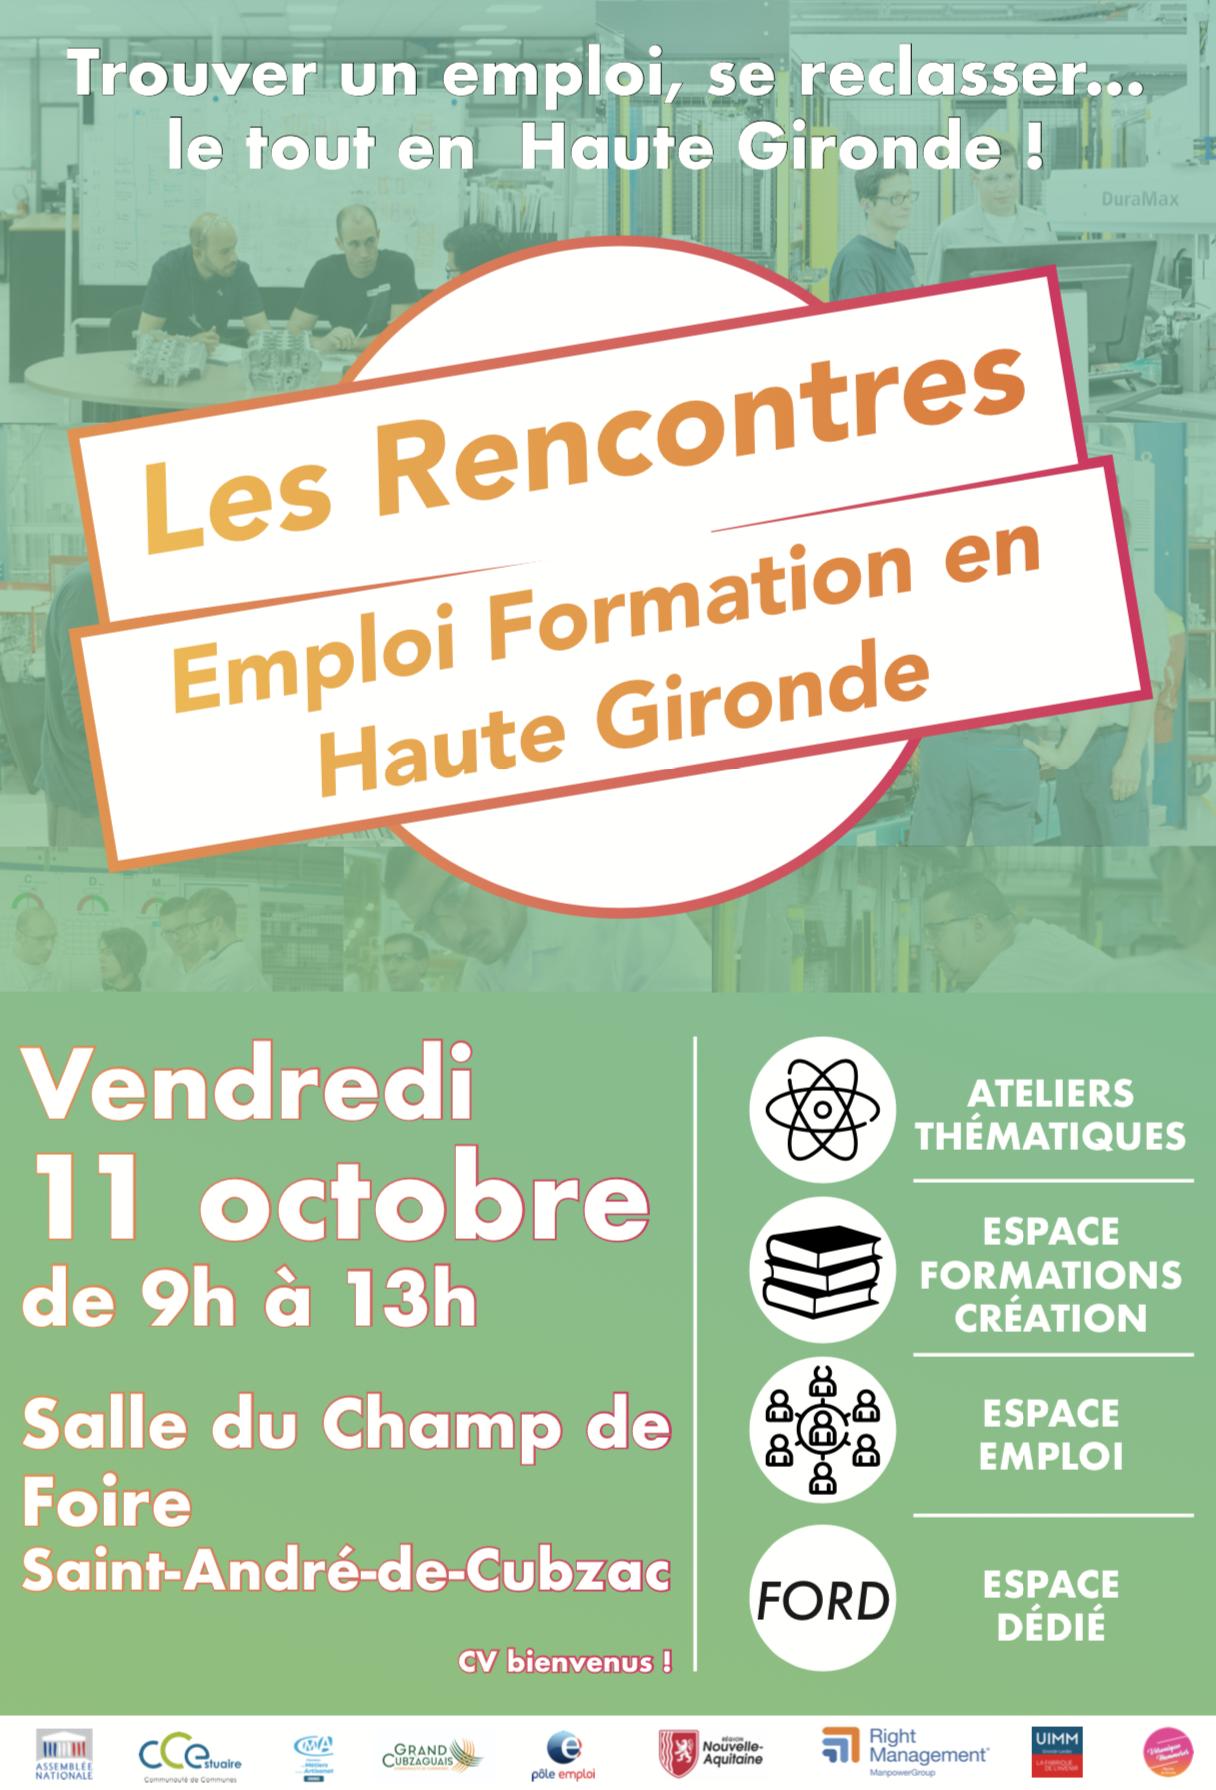 Les Rencontres Emploi Formation en Haute Gironde